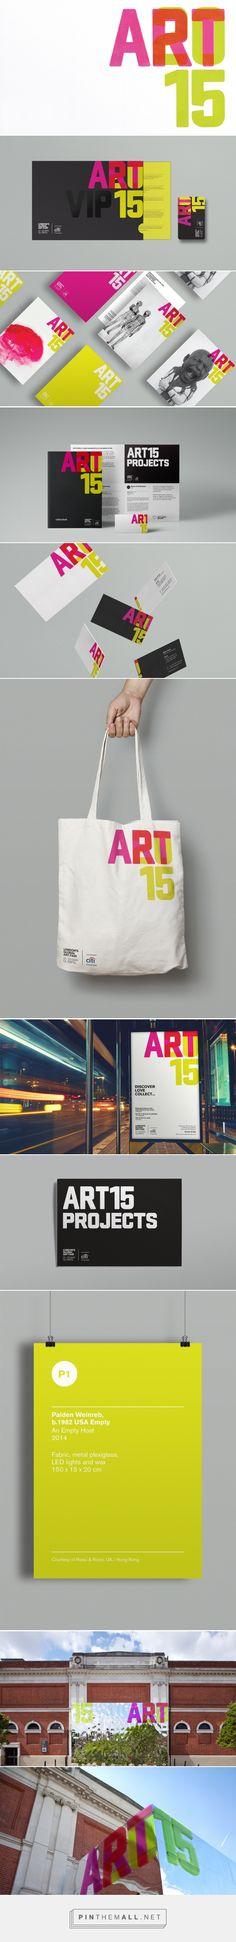 Art15 Branding by The Plant | Fivestar Branding – Design and Branding Agency & Inspiration Gallery